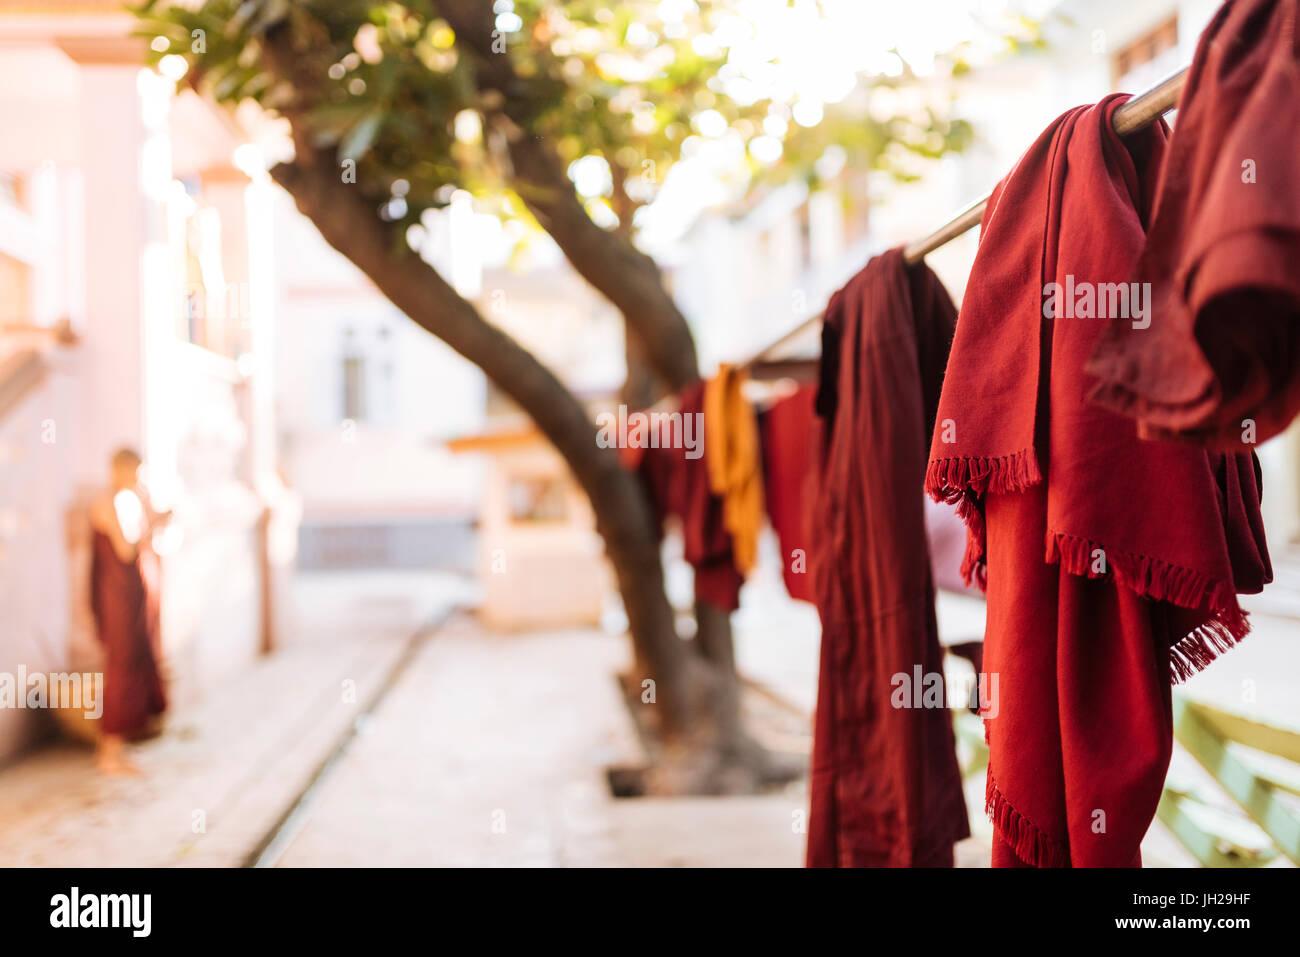 Buddhist monks' robes hanging to dry, Amarapura, Mandalay, Mandalay Region, Myanmar (Burma), Asia - Stock Image